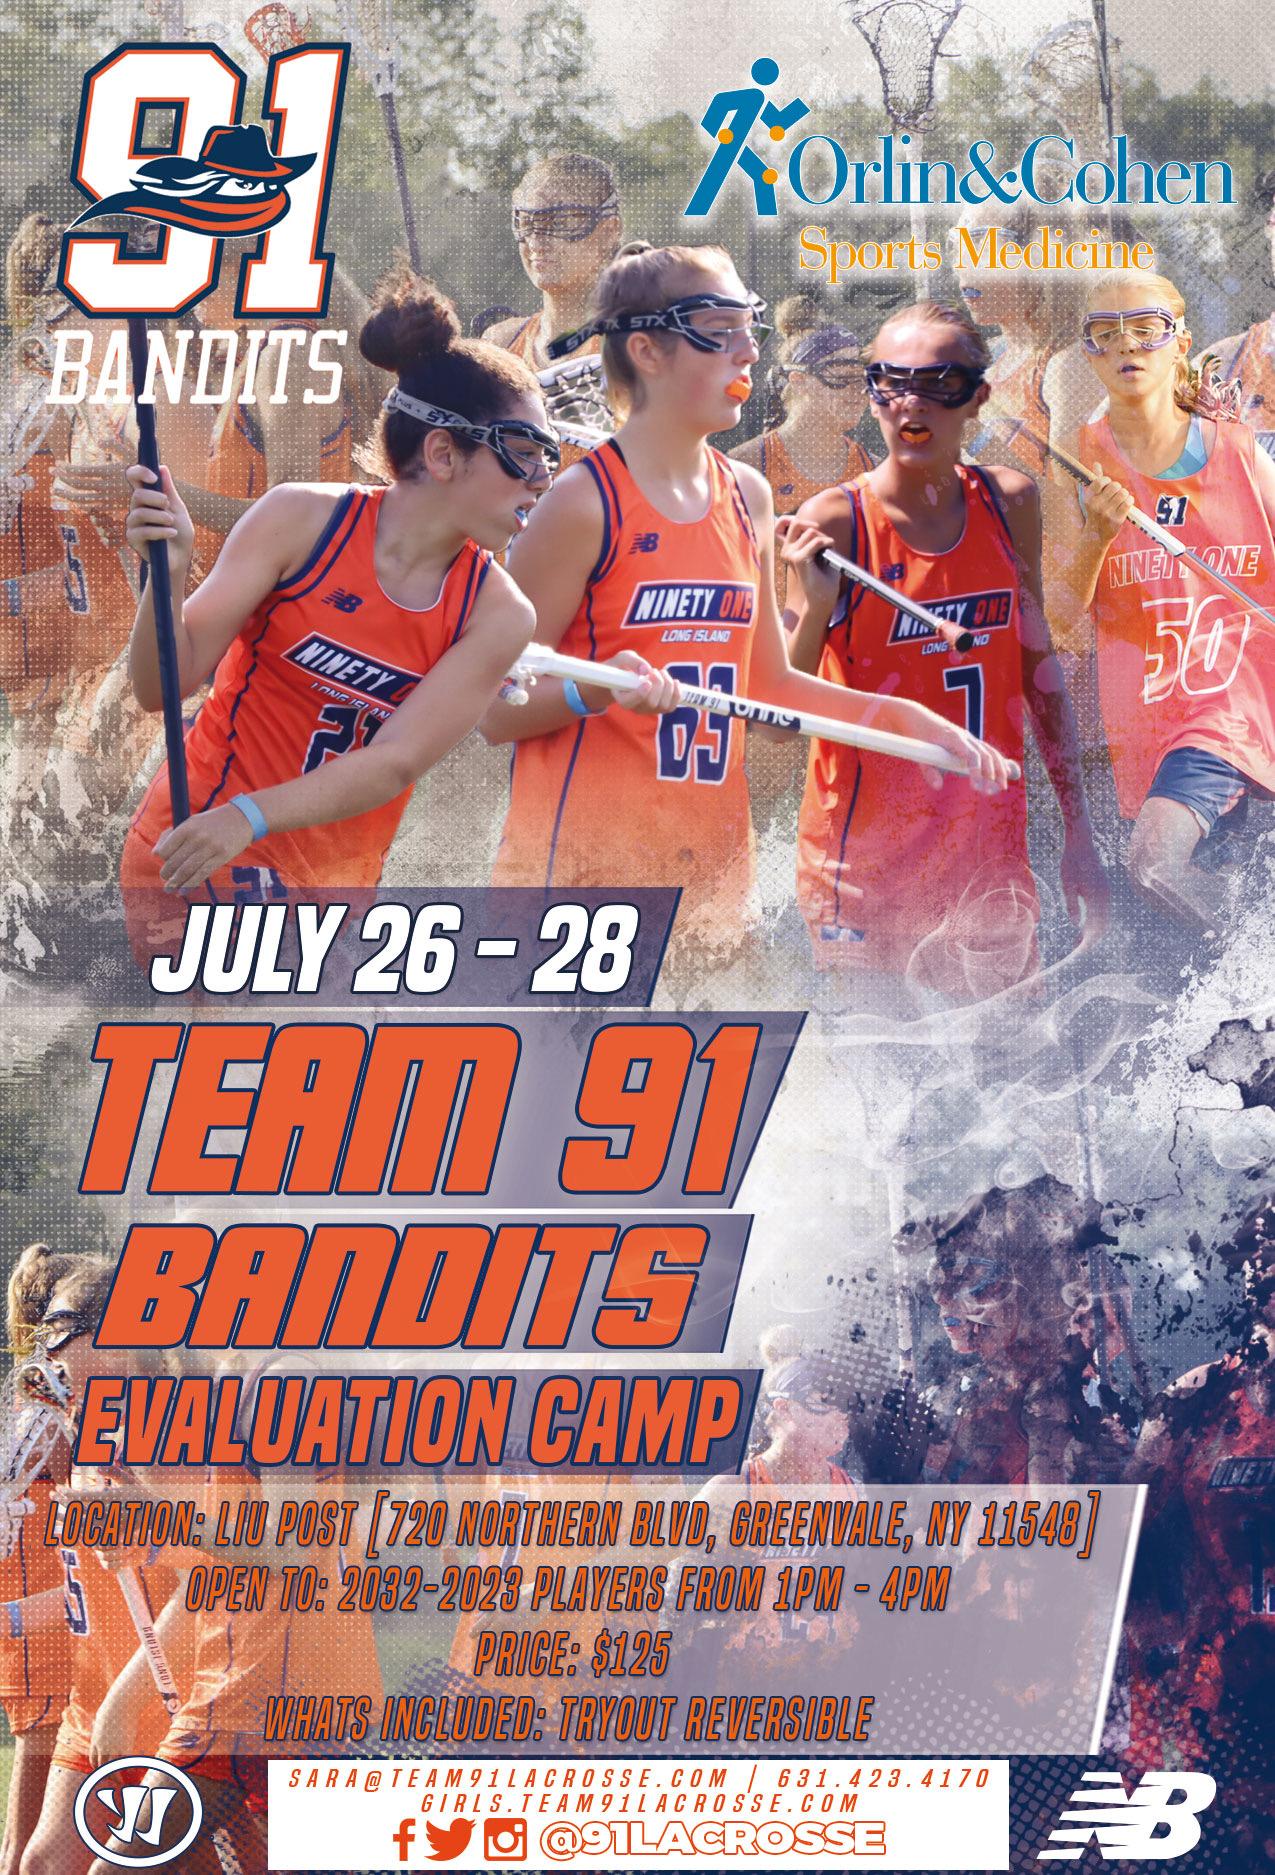 2021-Team91LI_Girls_Bandits-EvaluationCamp